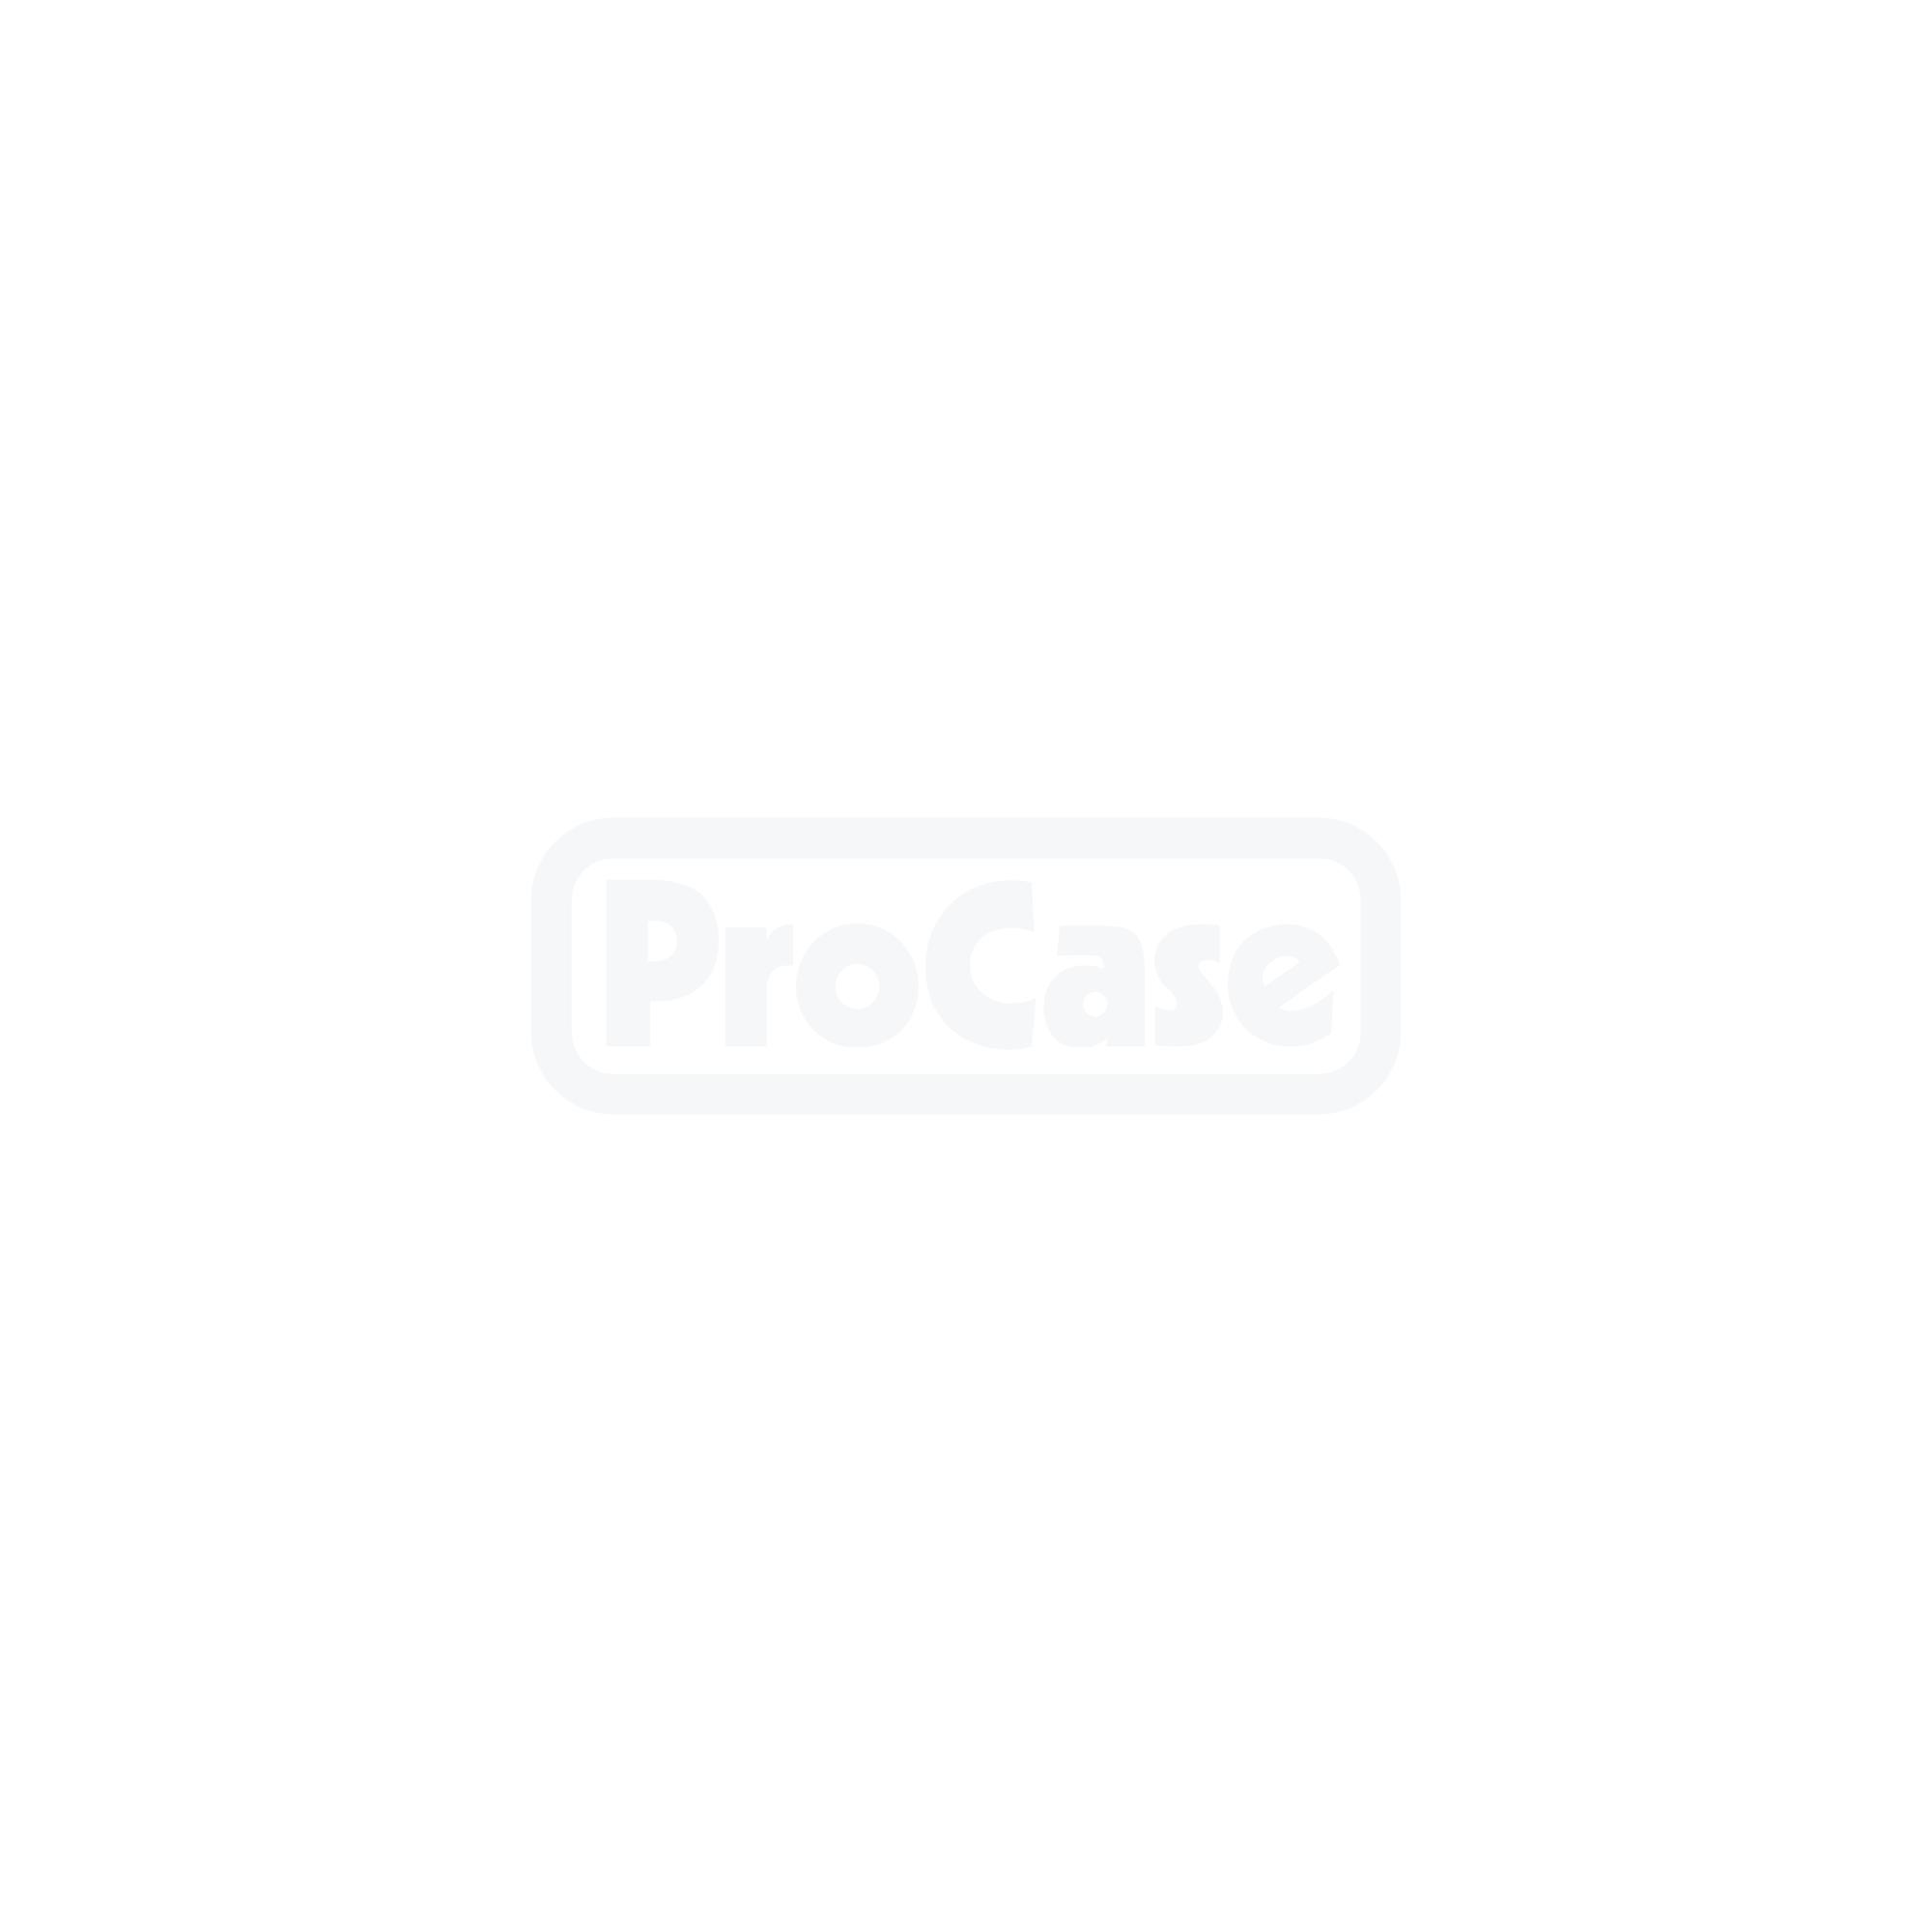 SKB 3i Koffer 1510-6B mit Rasterschaumstoff